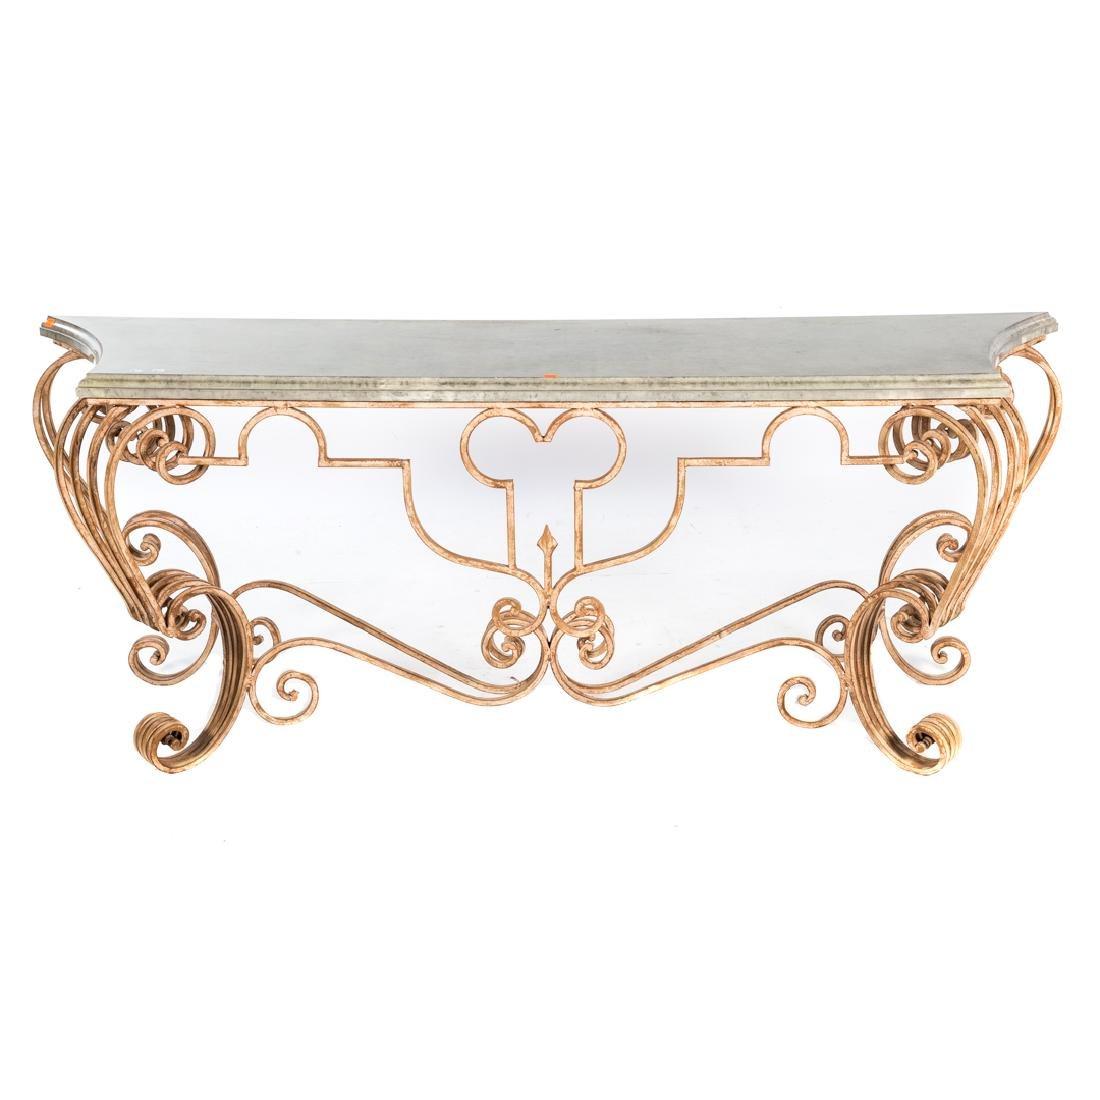 Italian Rococo style iron console table,